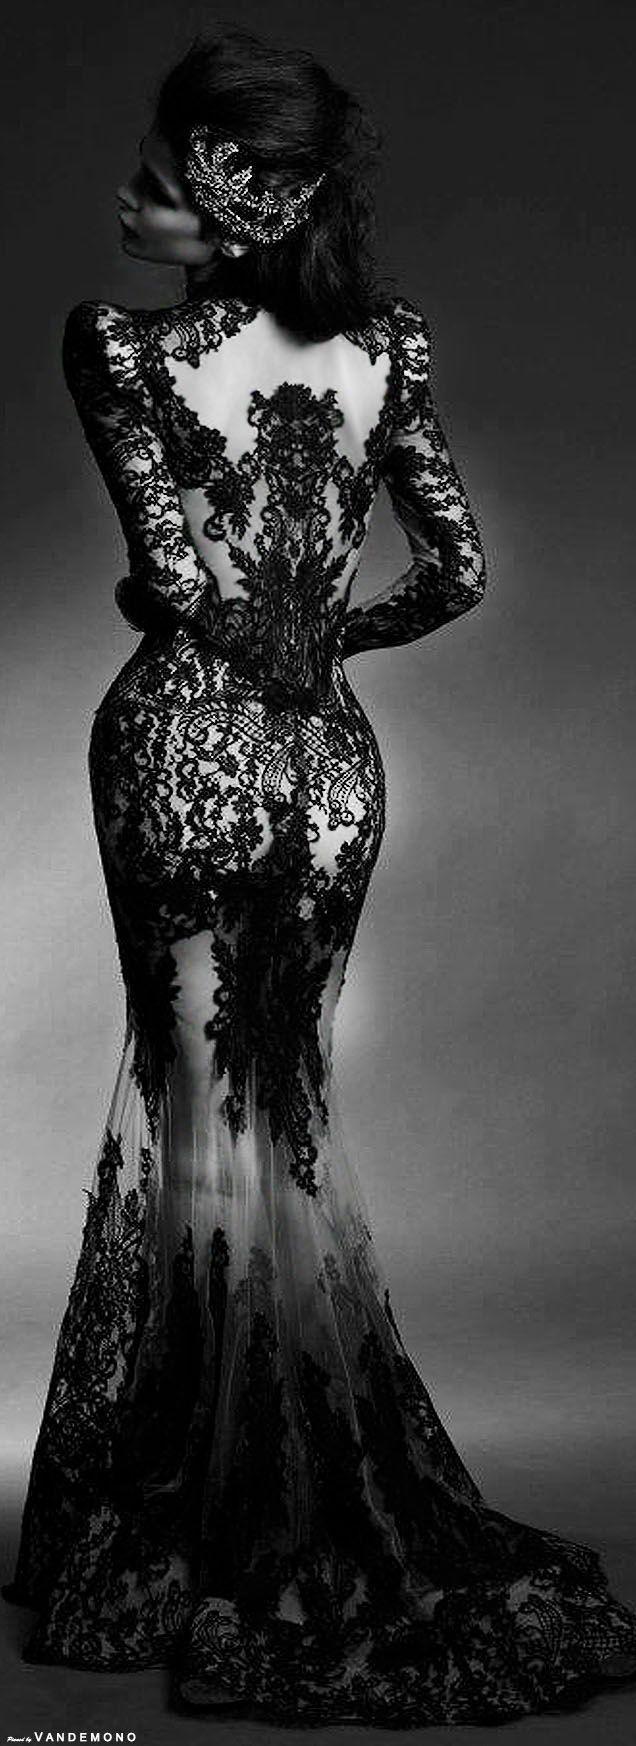 would make a gorgeous gothic wedding dress ♥️